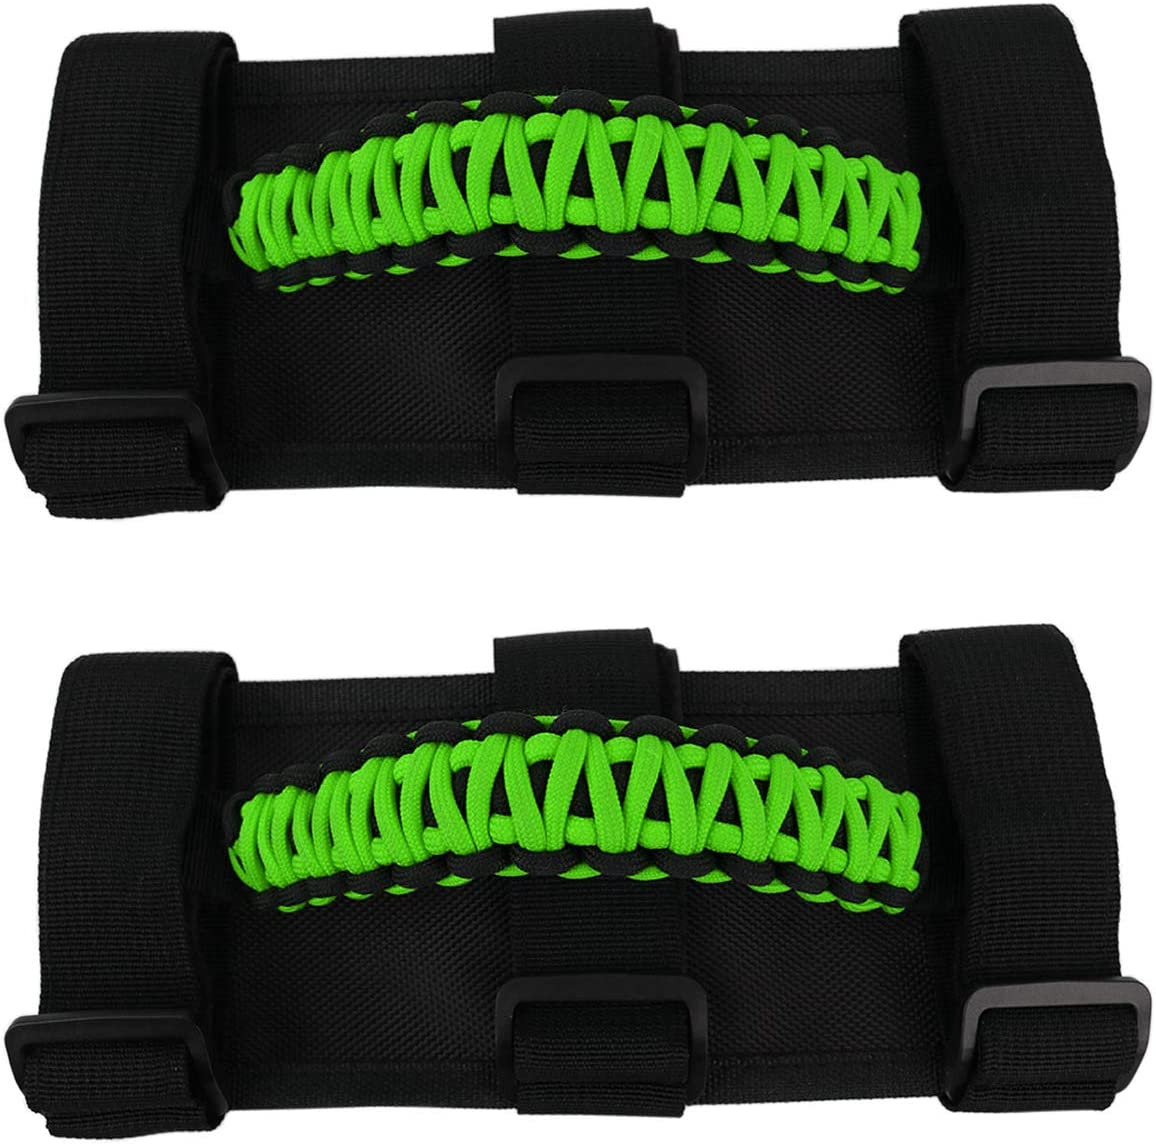 Jade Onlines 20 PCS Grille Fastener Rivet Push Pin Clips Screw Retainer Rivet Fasteners Trim Moulding Clip for Jeep JK /& JKU 2007-2018